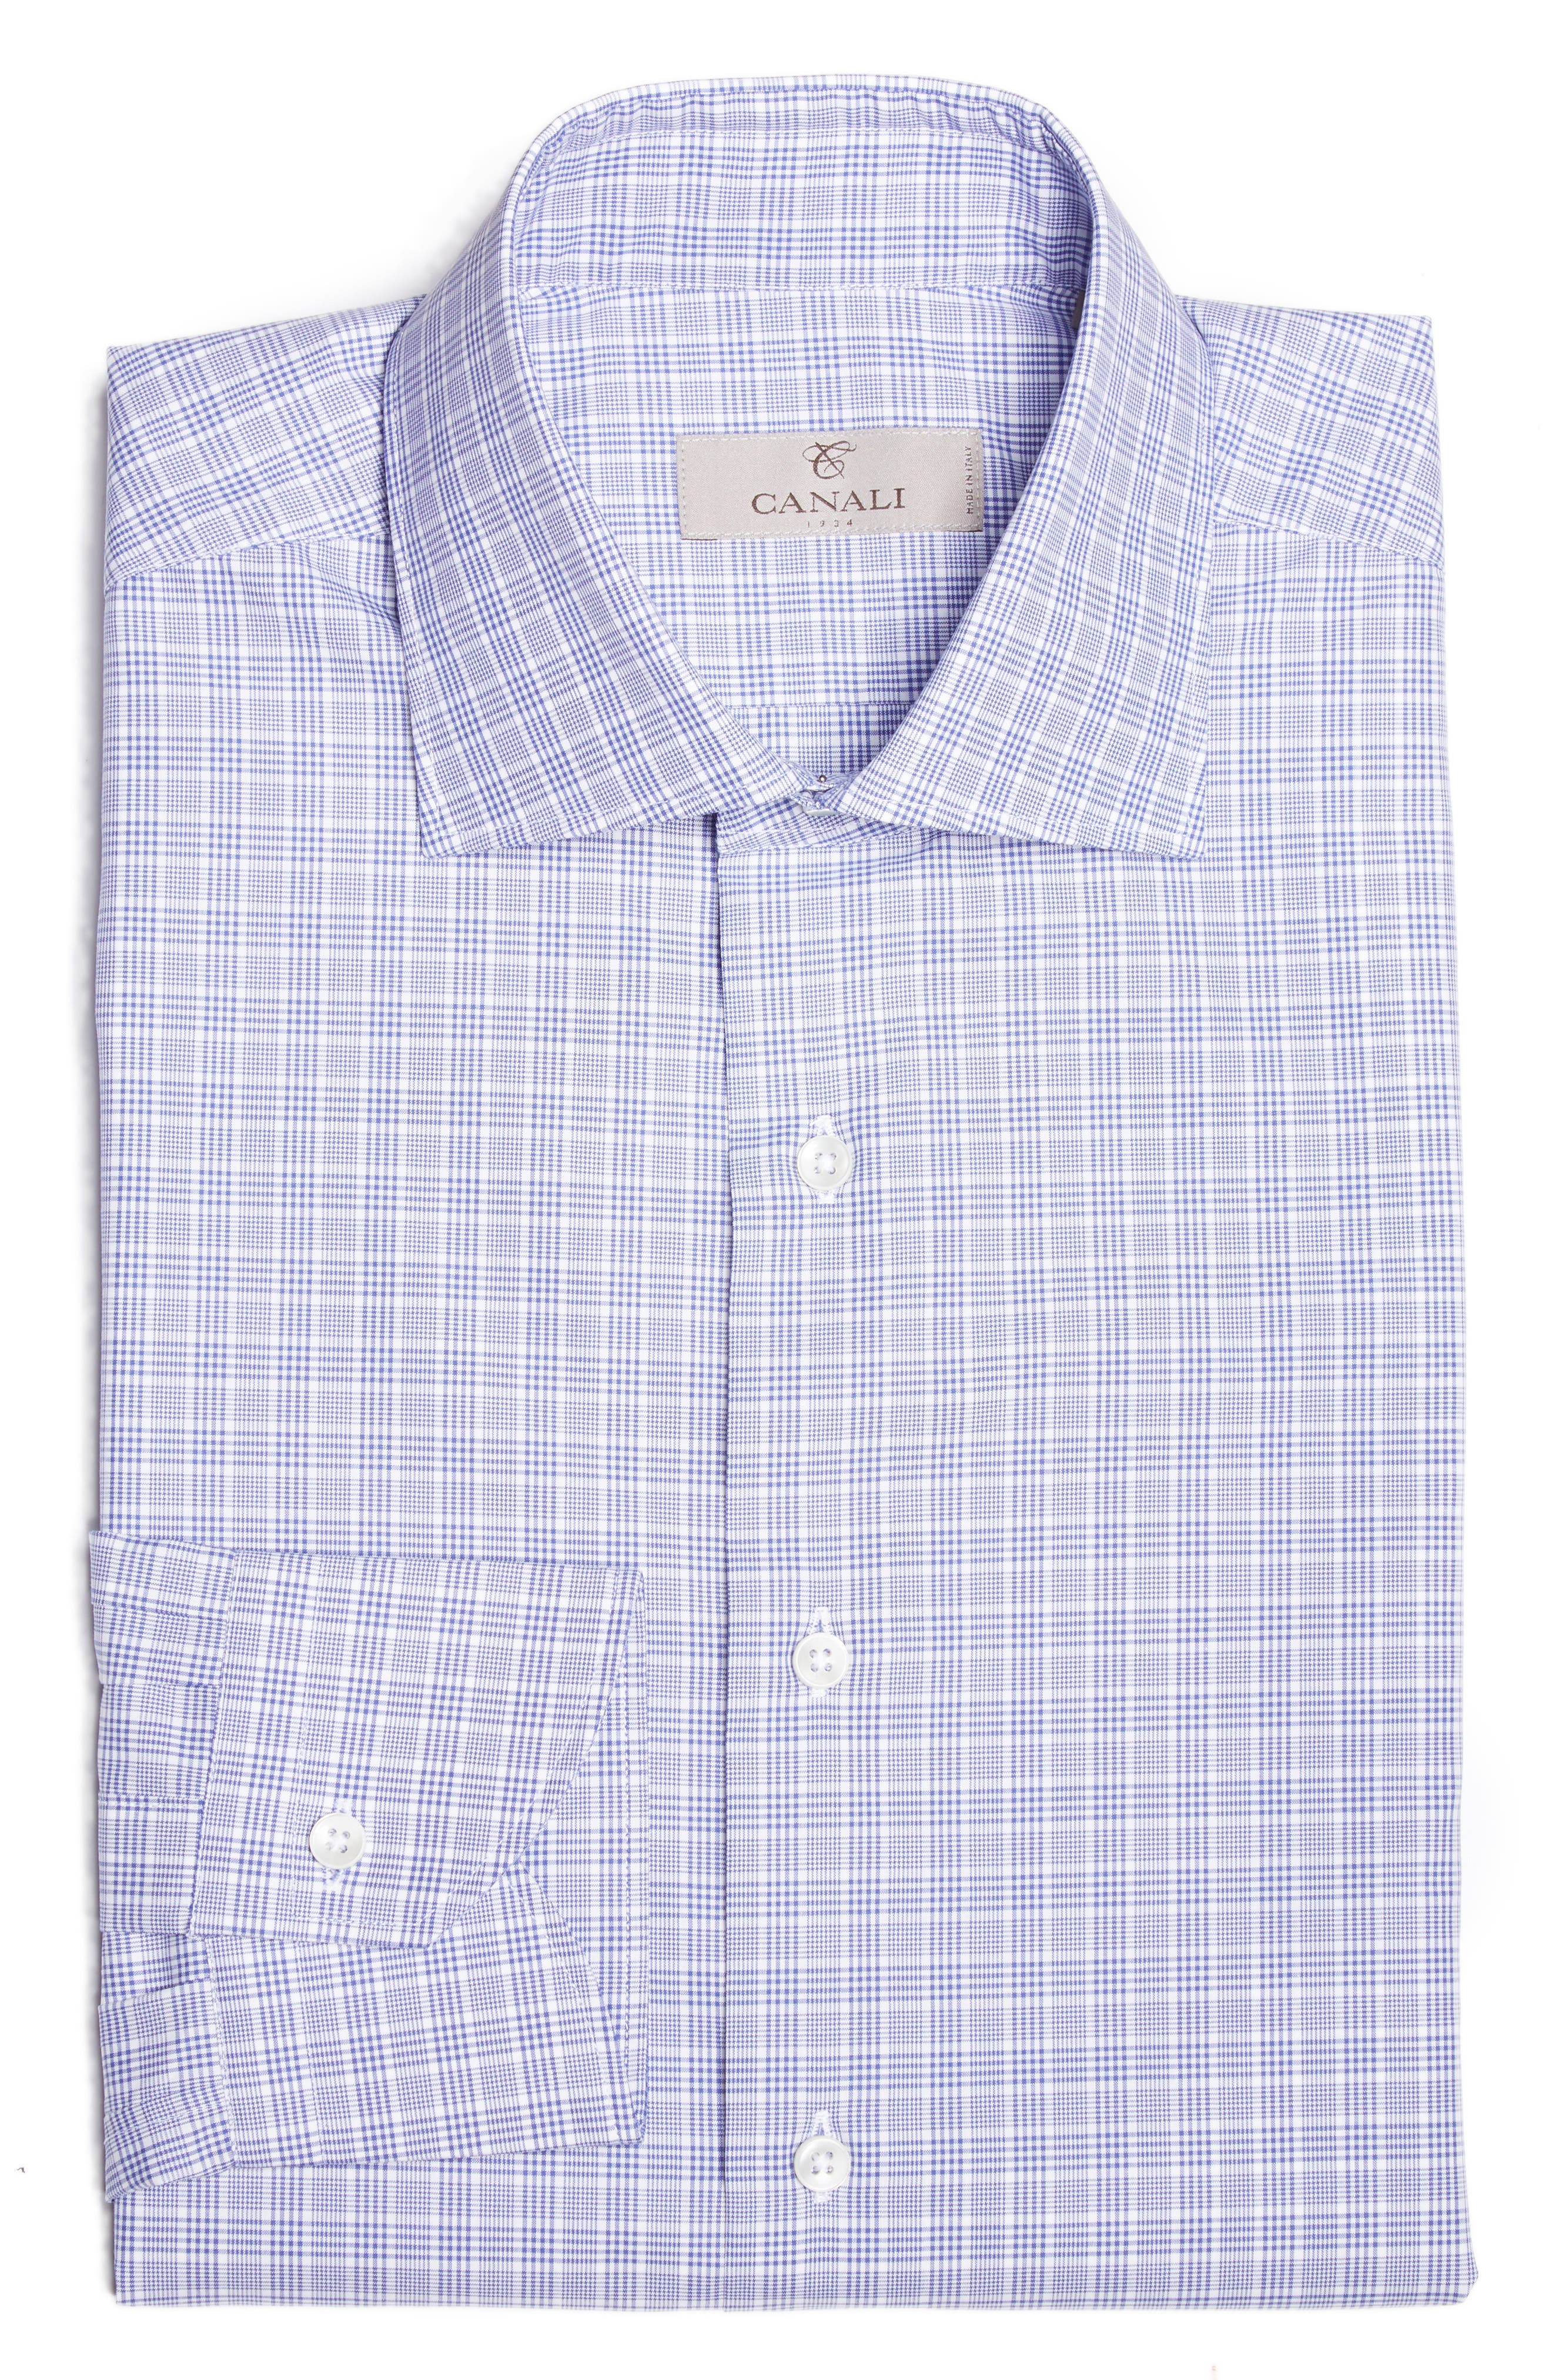 Alternate Image 1 Selected - Canali Regular Fit Plaid Dress Shirt